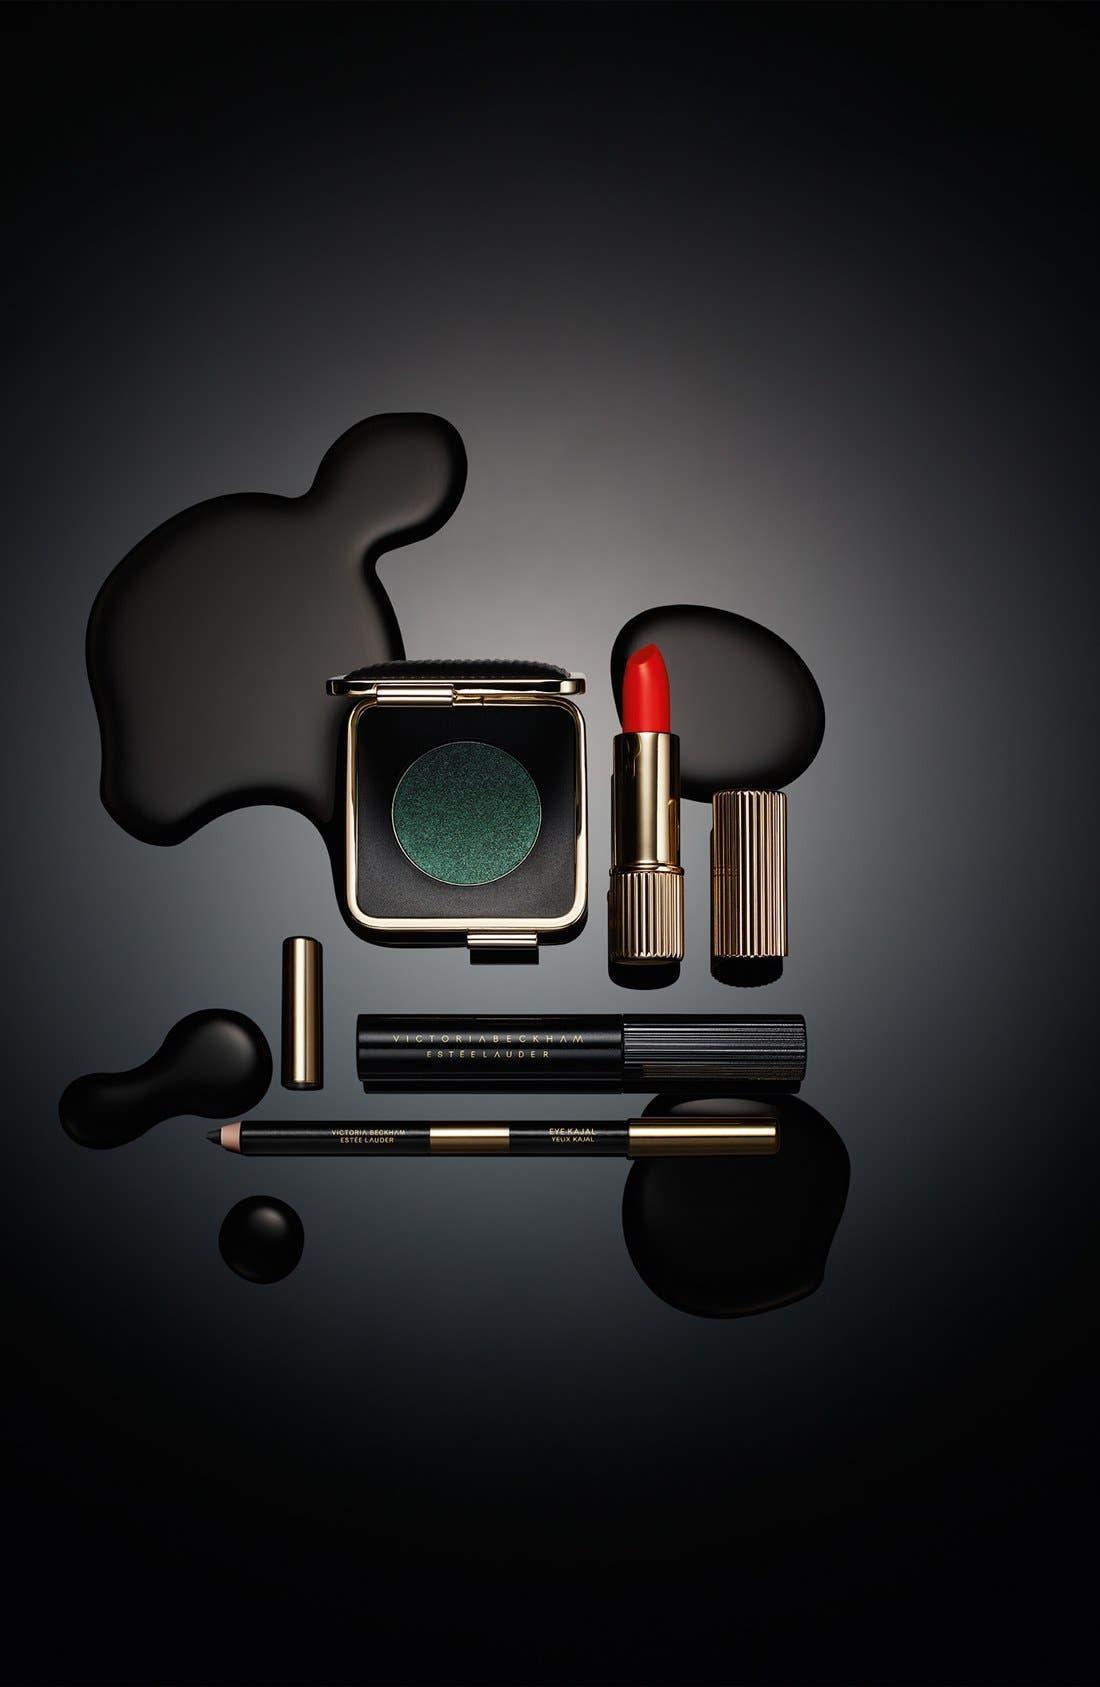 Victoria Beckham Chilean Sunset Lipstick in Gold Case,                             Alternate thumbnail 2, color,                             600